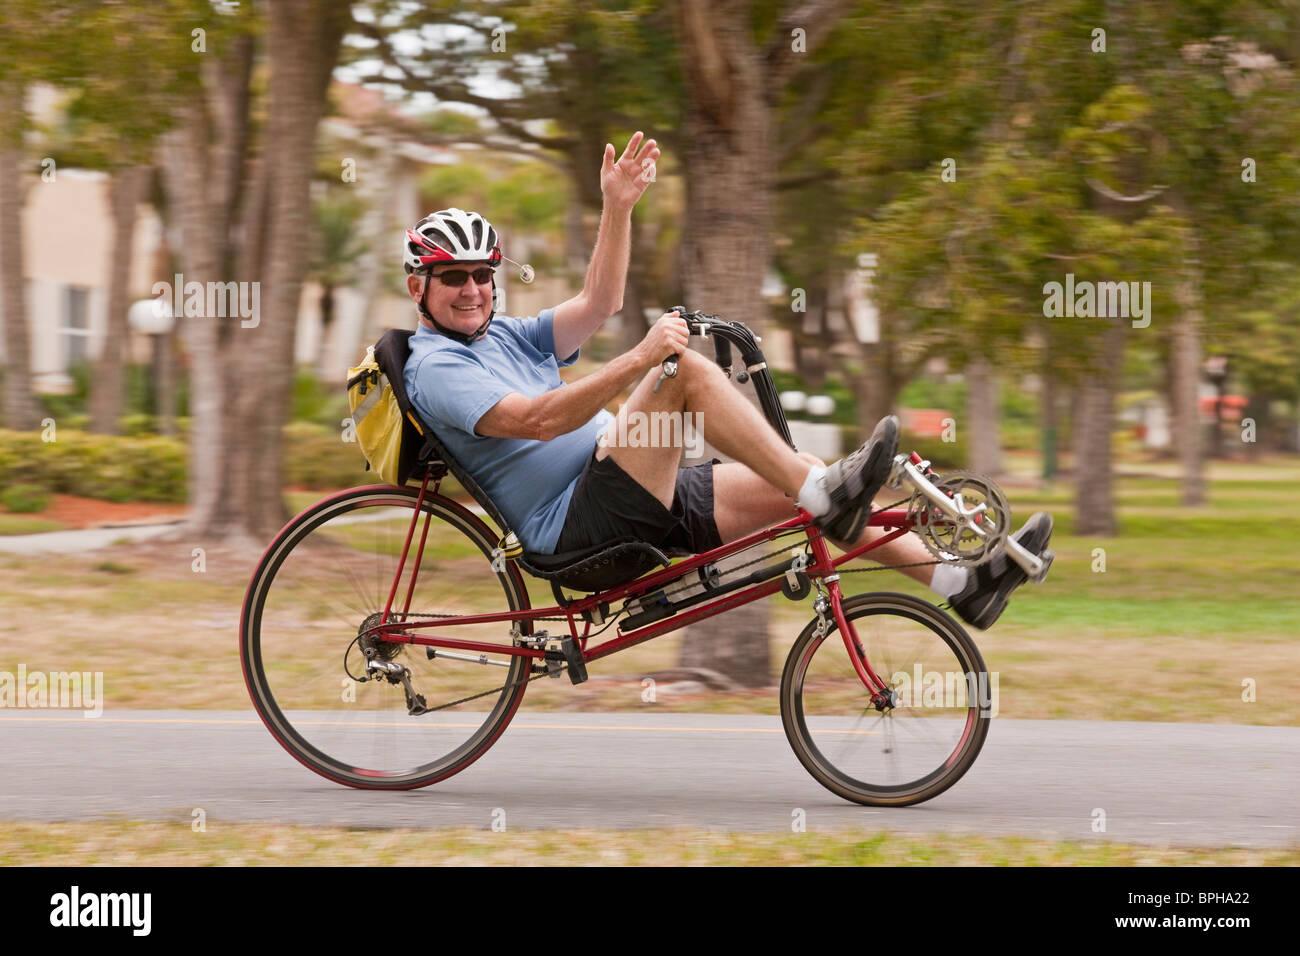 Recumbent Bike Stock Photos & Recumbent Bike Stock Images